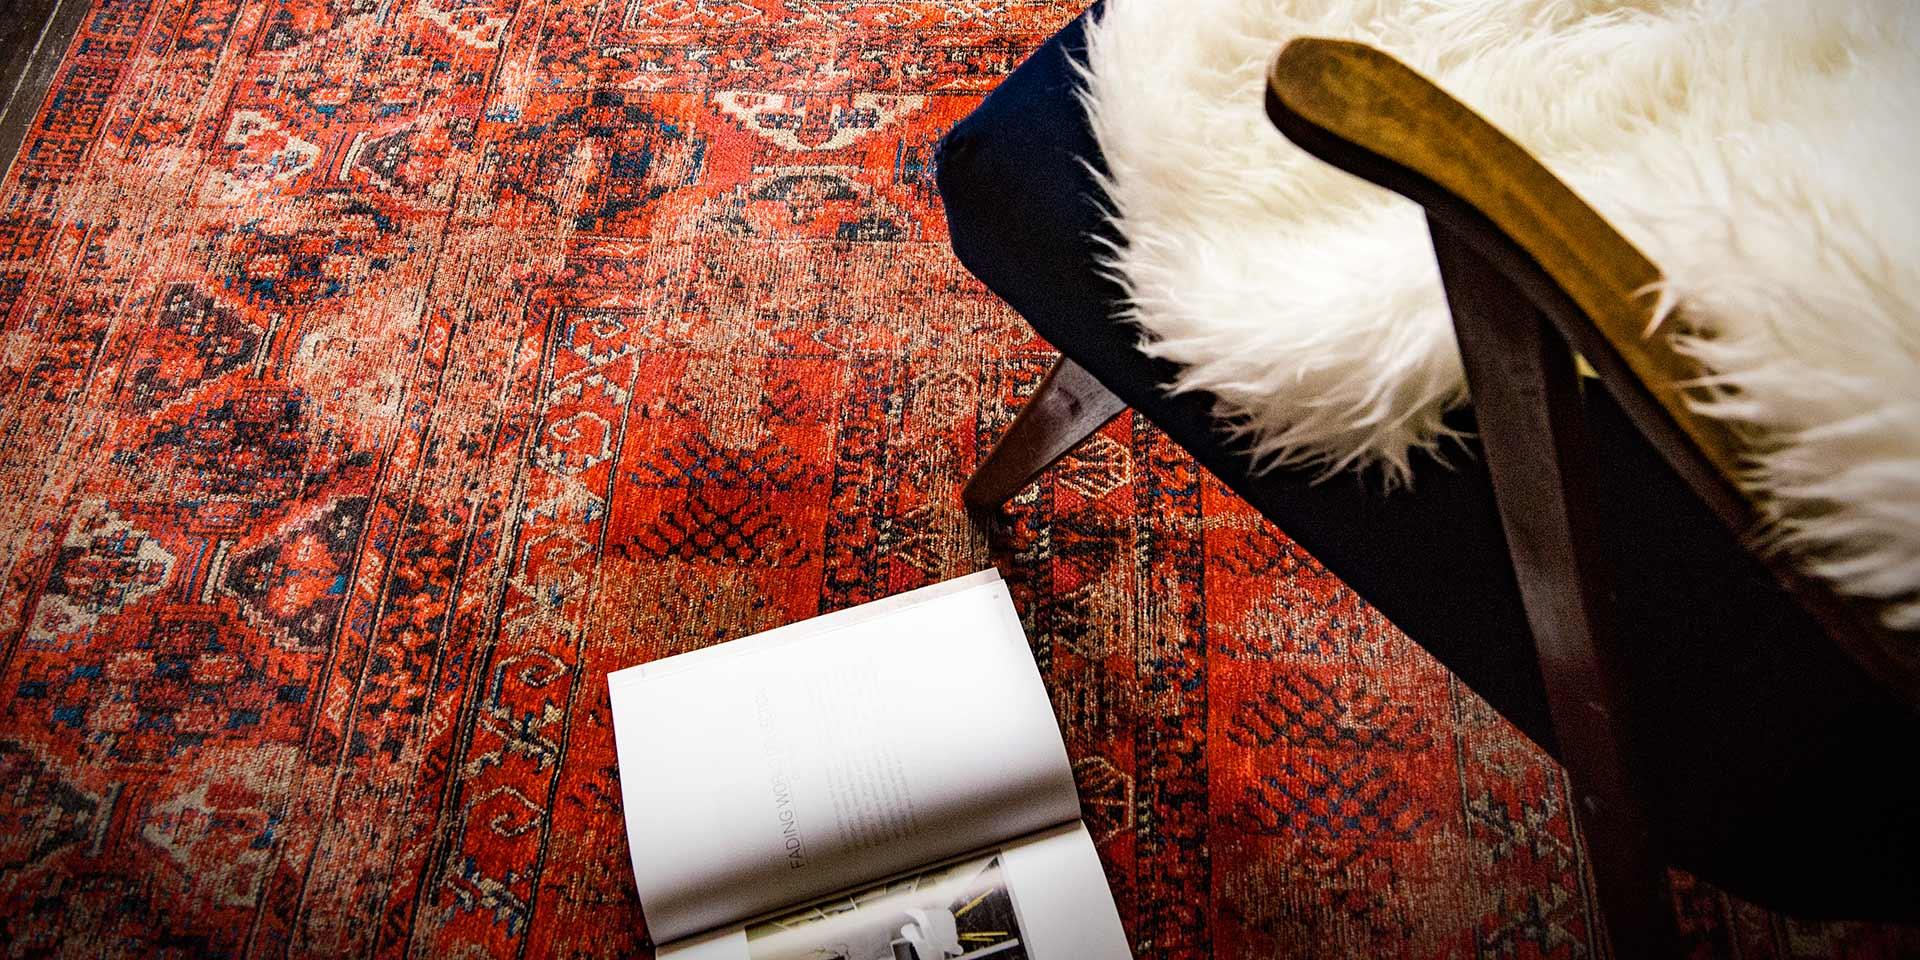 louis de poortere. Black Bedroom Furniture Sets. Home Design Ideas